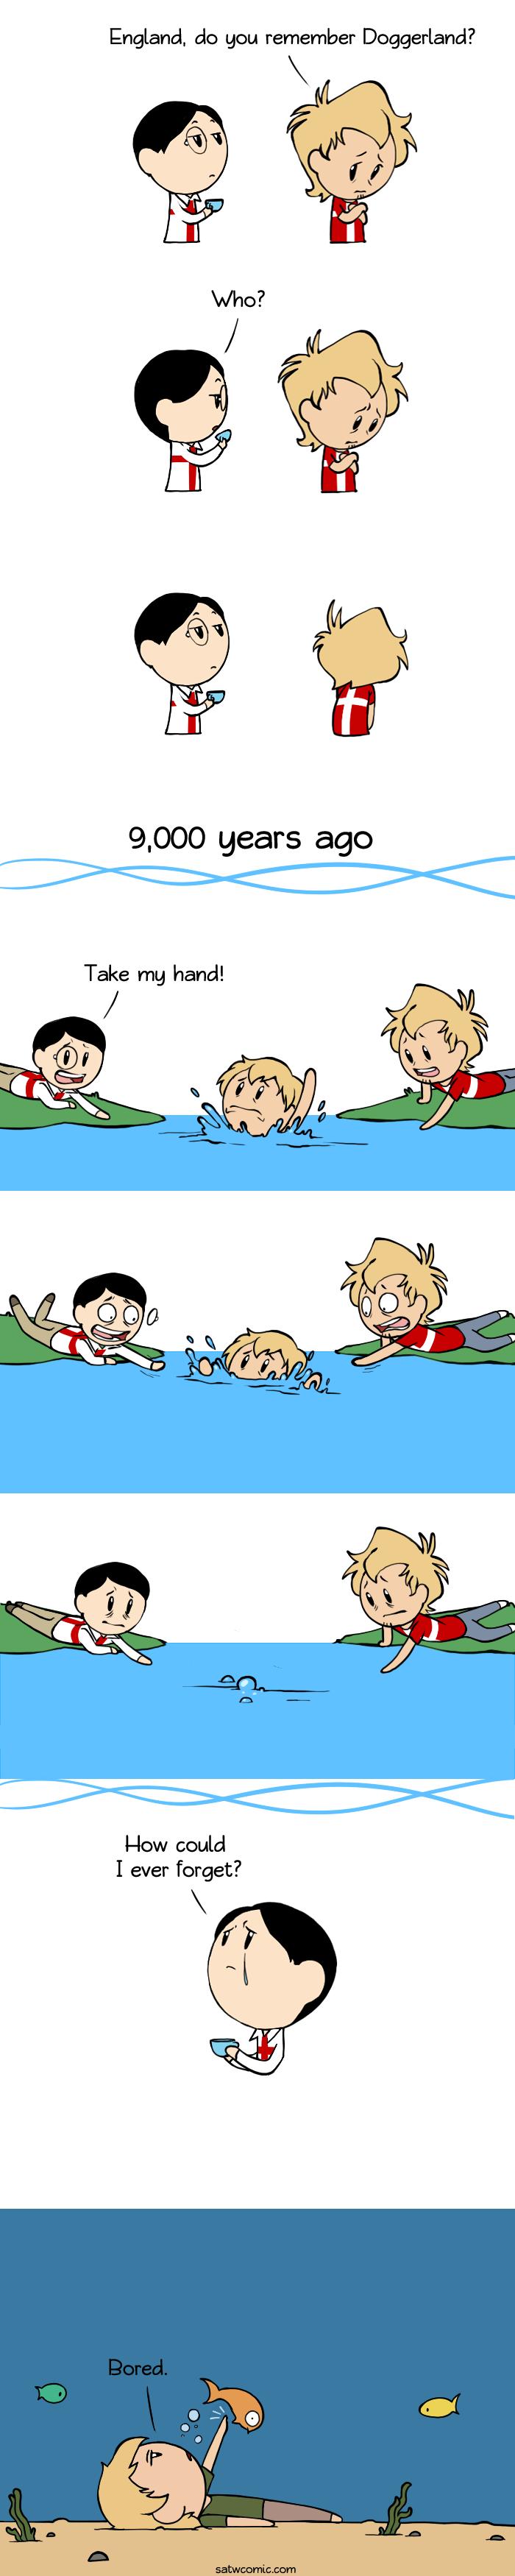 Lost Friends Scandinavia And The World Country Jokes Satw Comic Scandinavia